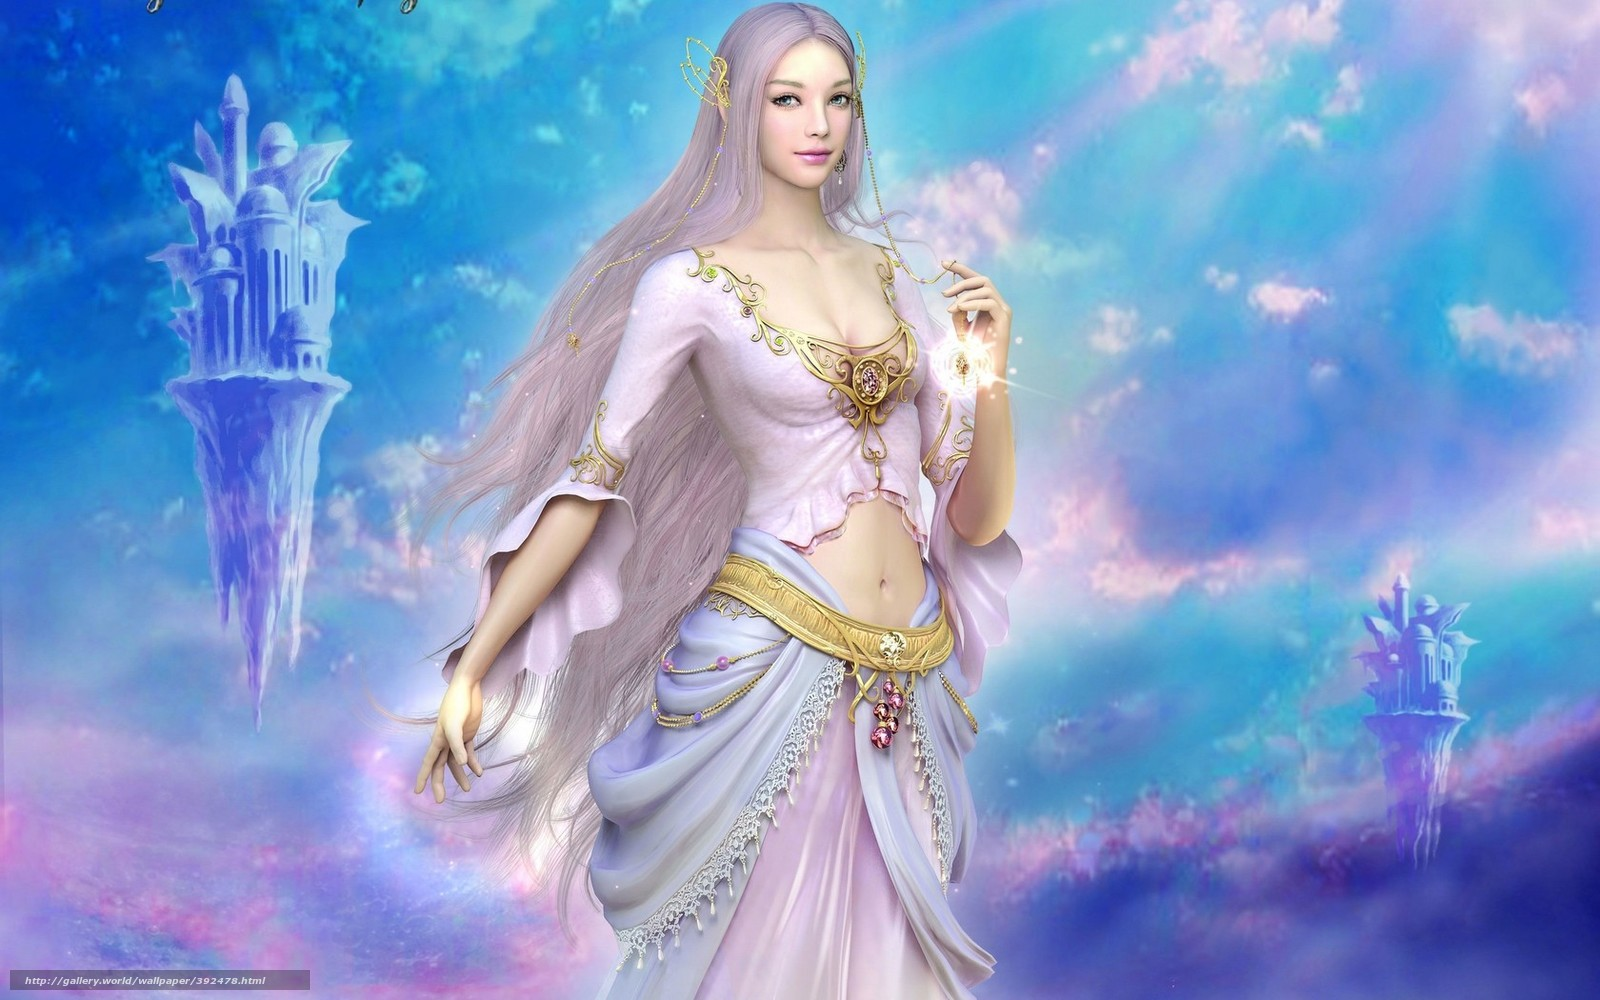 Download Wallpaper Eteyn Light And Darkness Goddess Beauty Free Desktop Wallpaper In The Resolution 1680x1050 Picture 392478